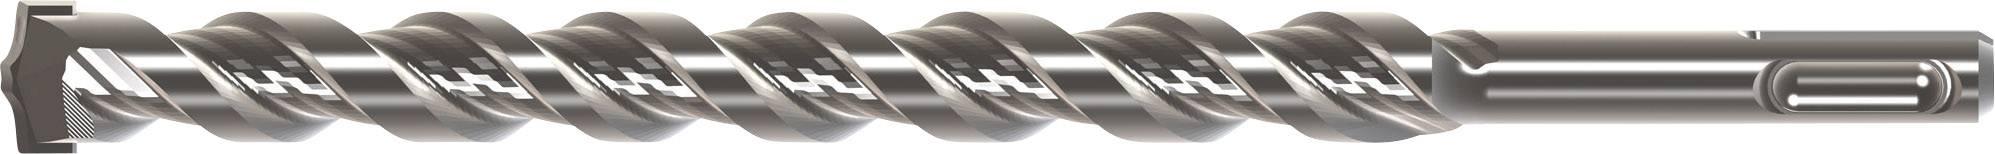 Tvrdý kov kladivový vrták Heller 156264, 8 mm, 160 mm, 1 ks